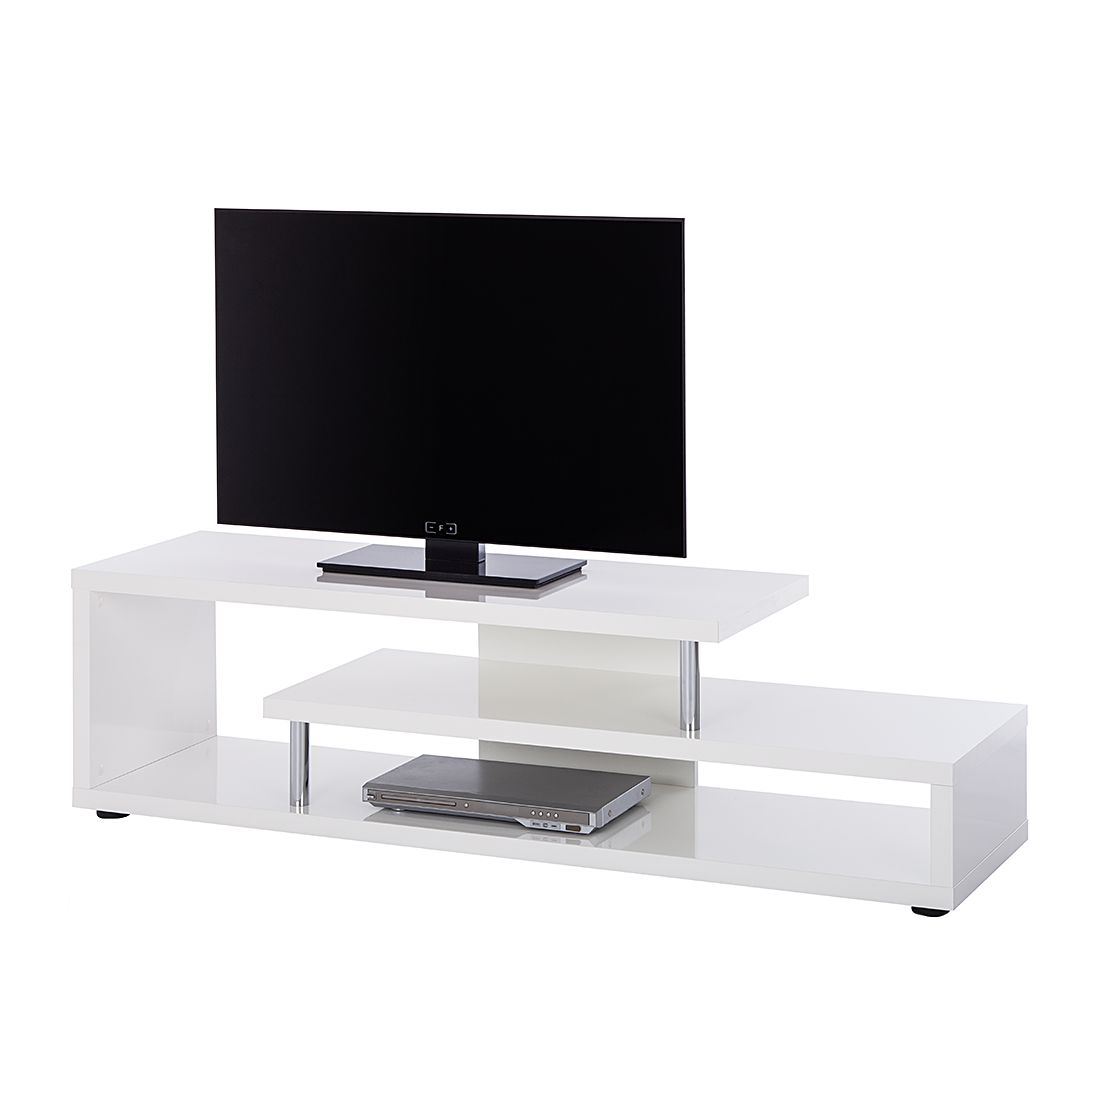 Tv Lowboard Wasco Tv Möbel Pinterest Möbel Tv Hifi Möbel Und